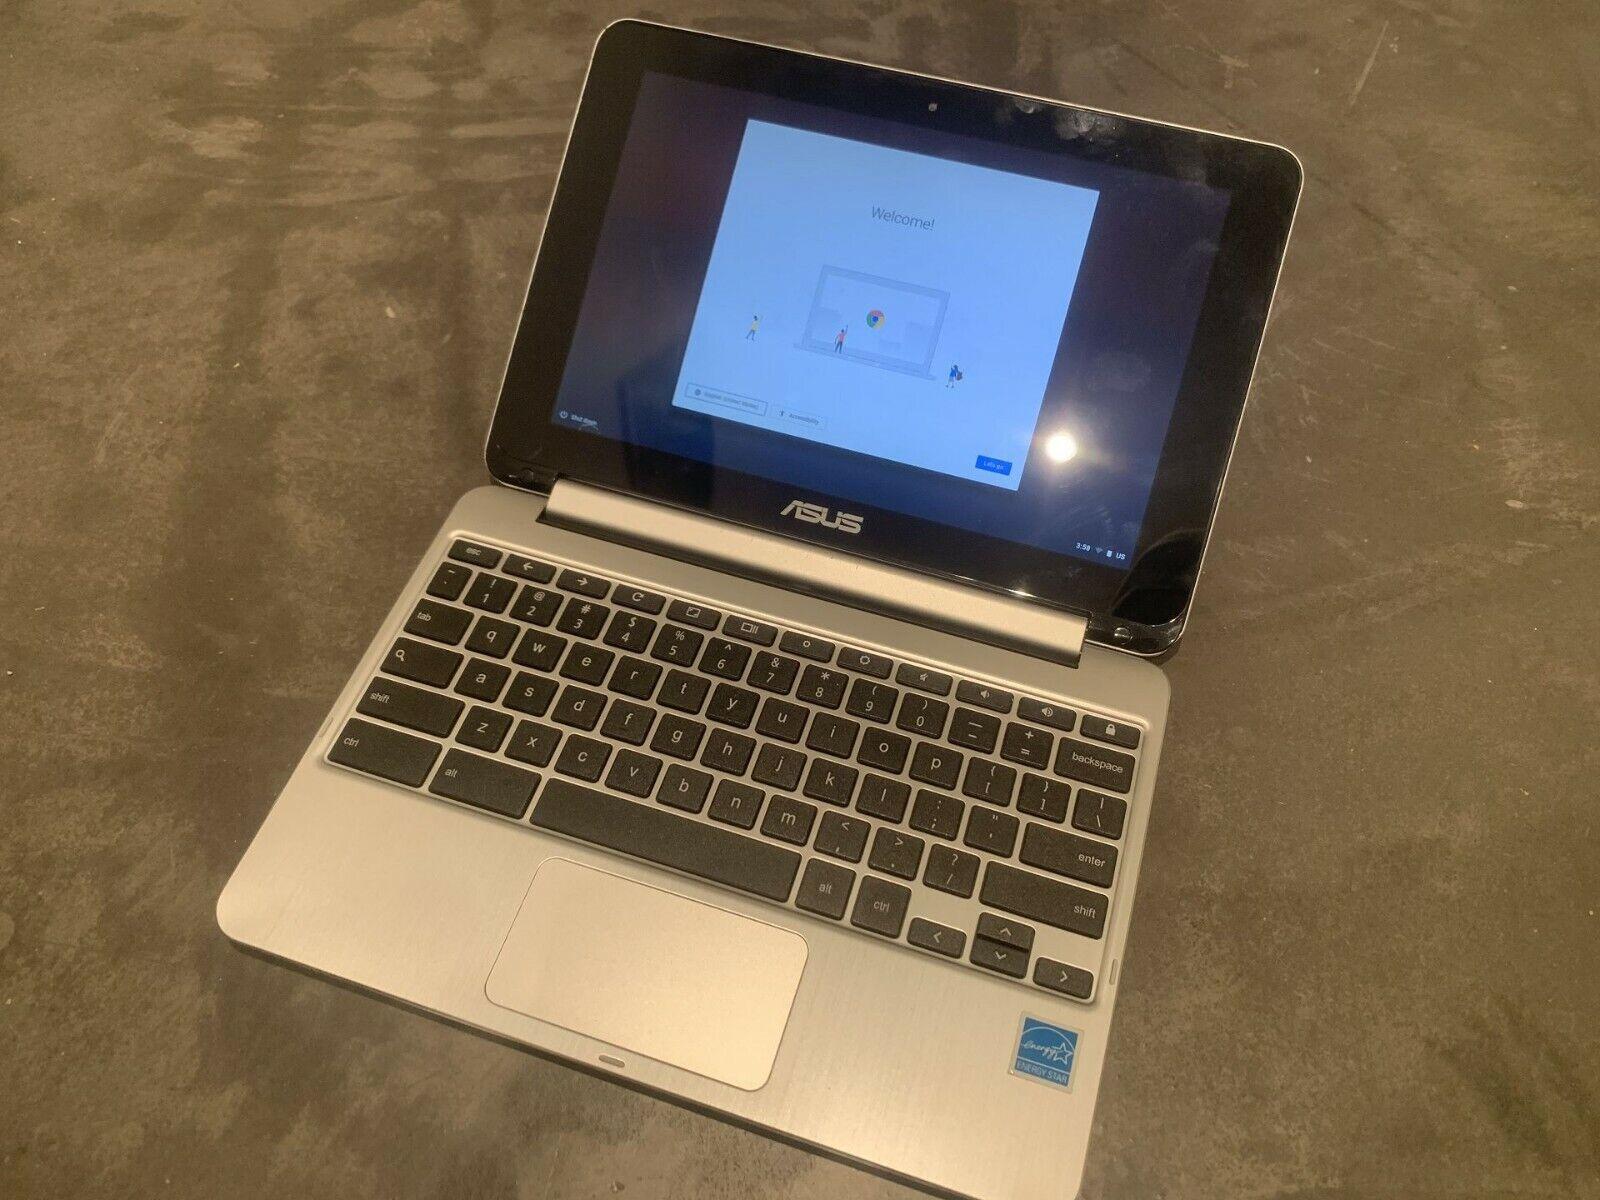 Asus chromebook flip c100p 1,6ghz 4gb ram 16gb ssd 10,1